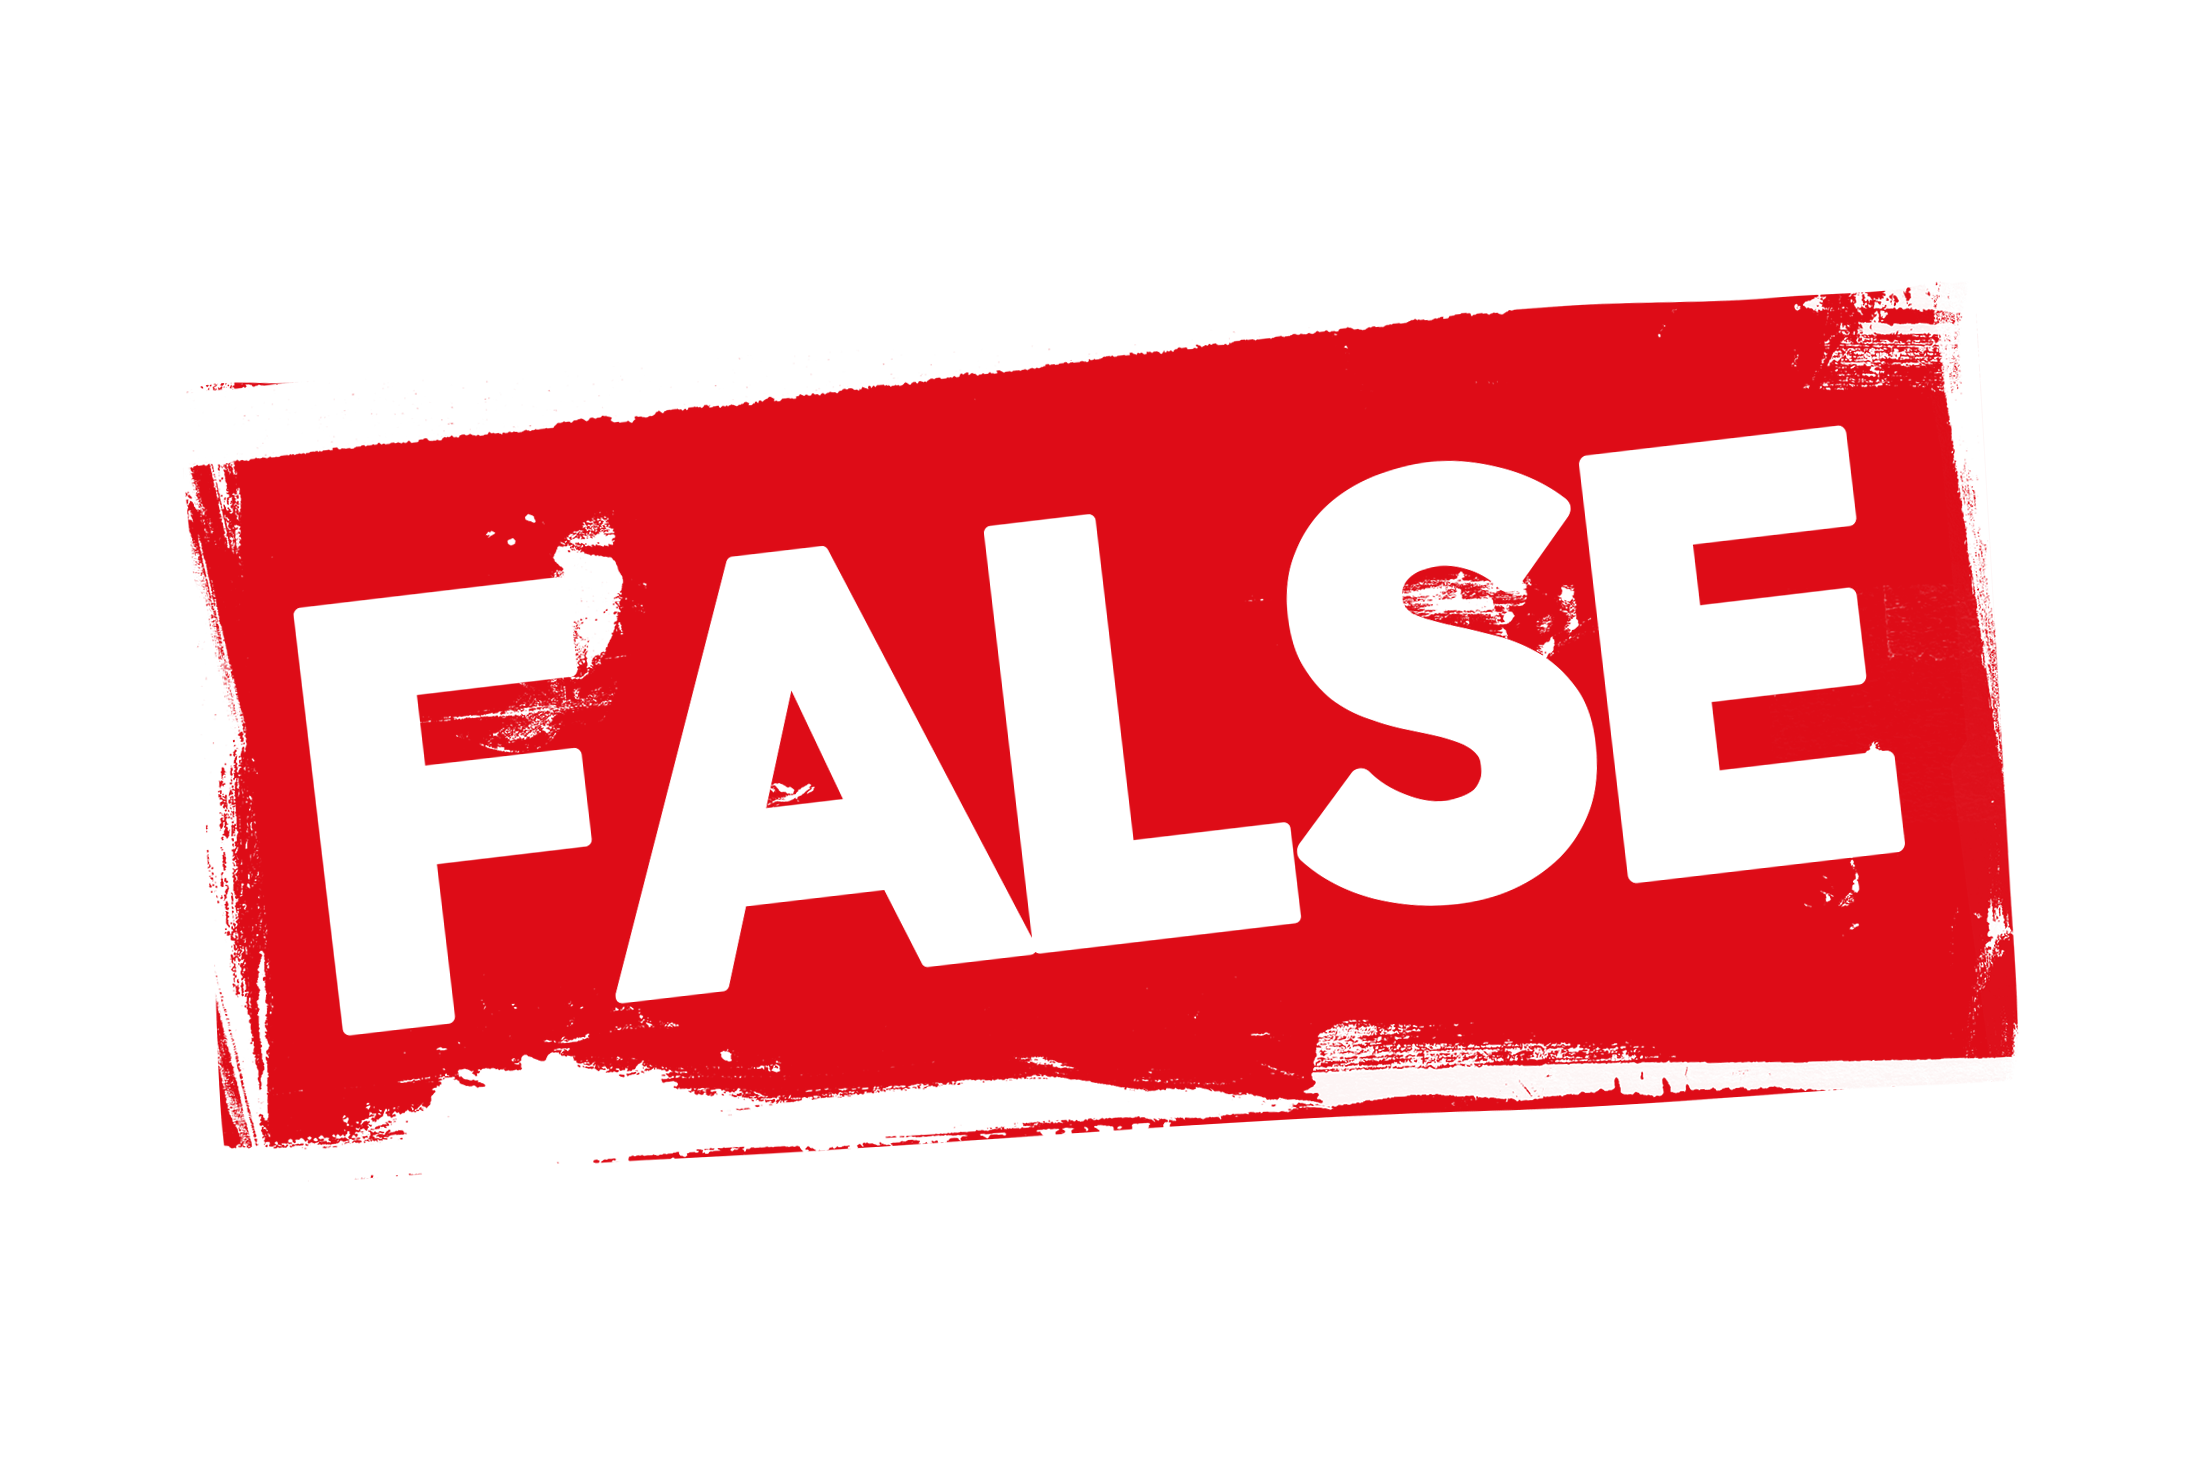 Grunge false label PSD